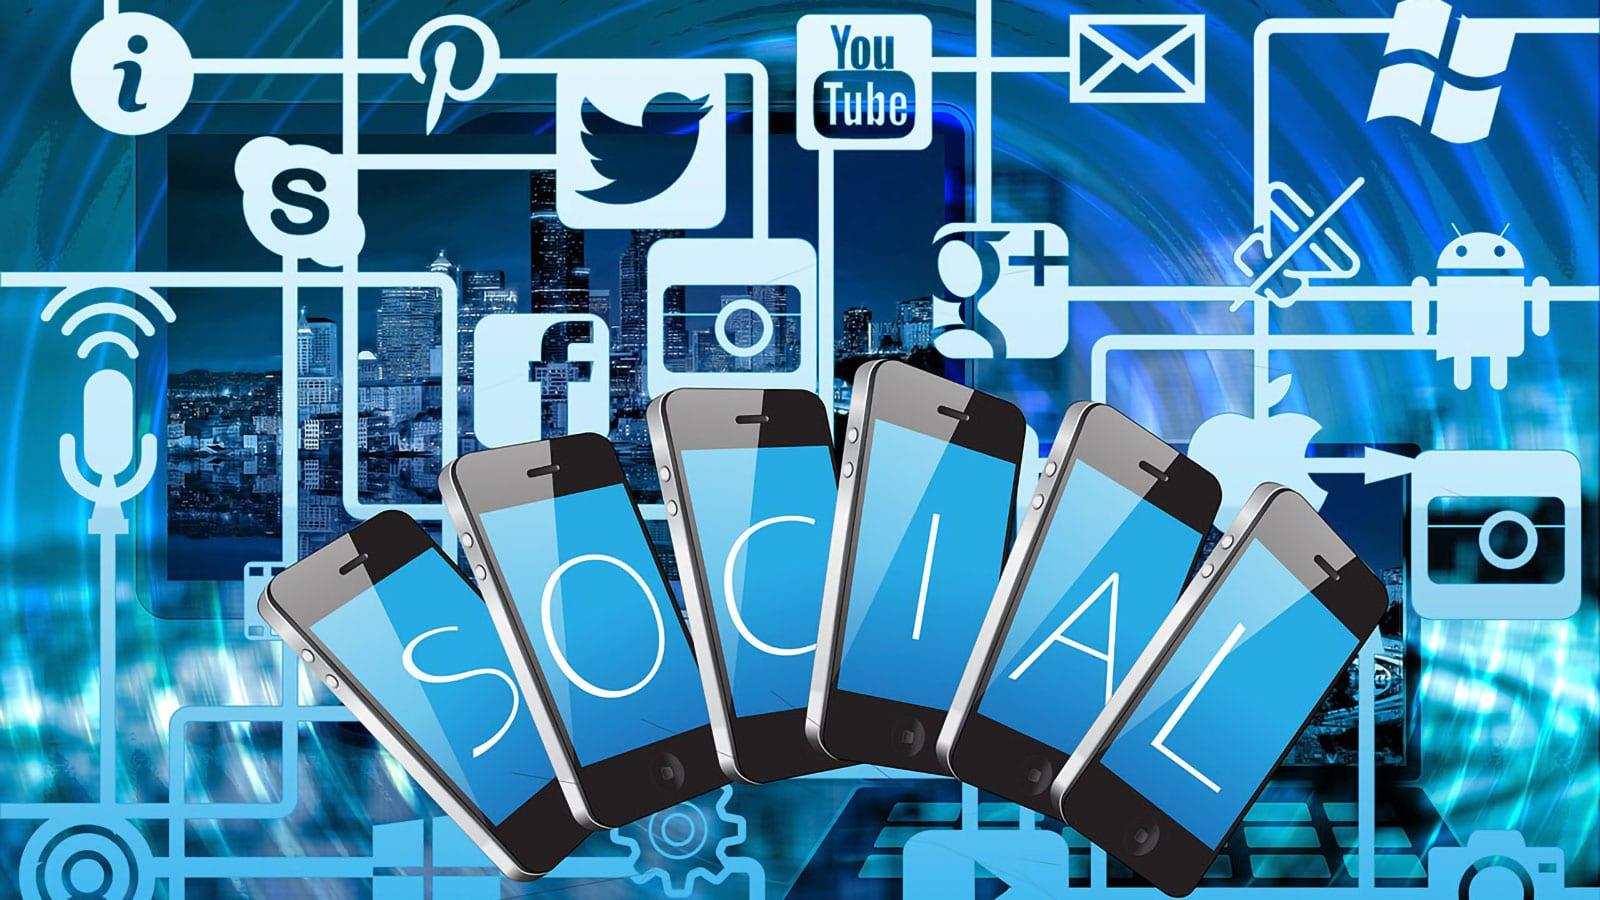 3 Reasons Why Nonprofits Should Utilize Social Media